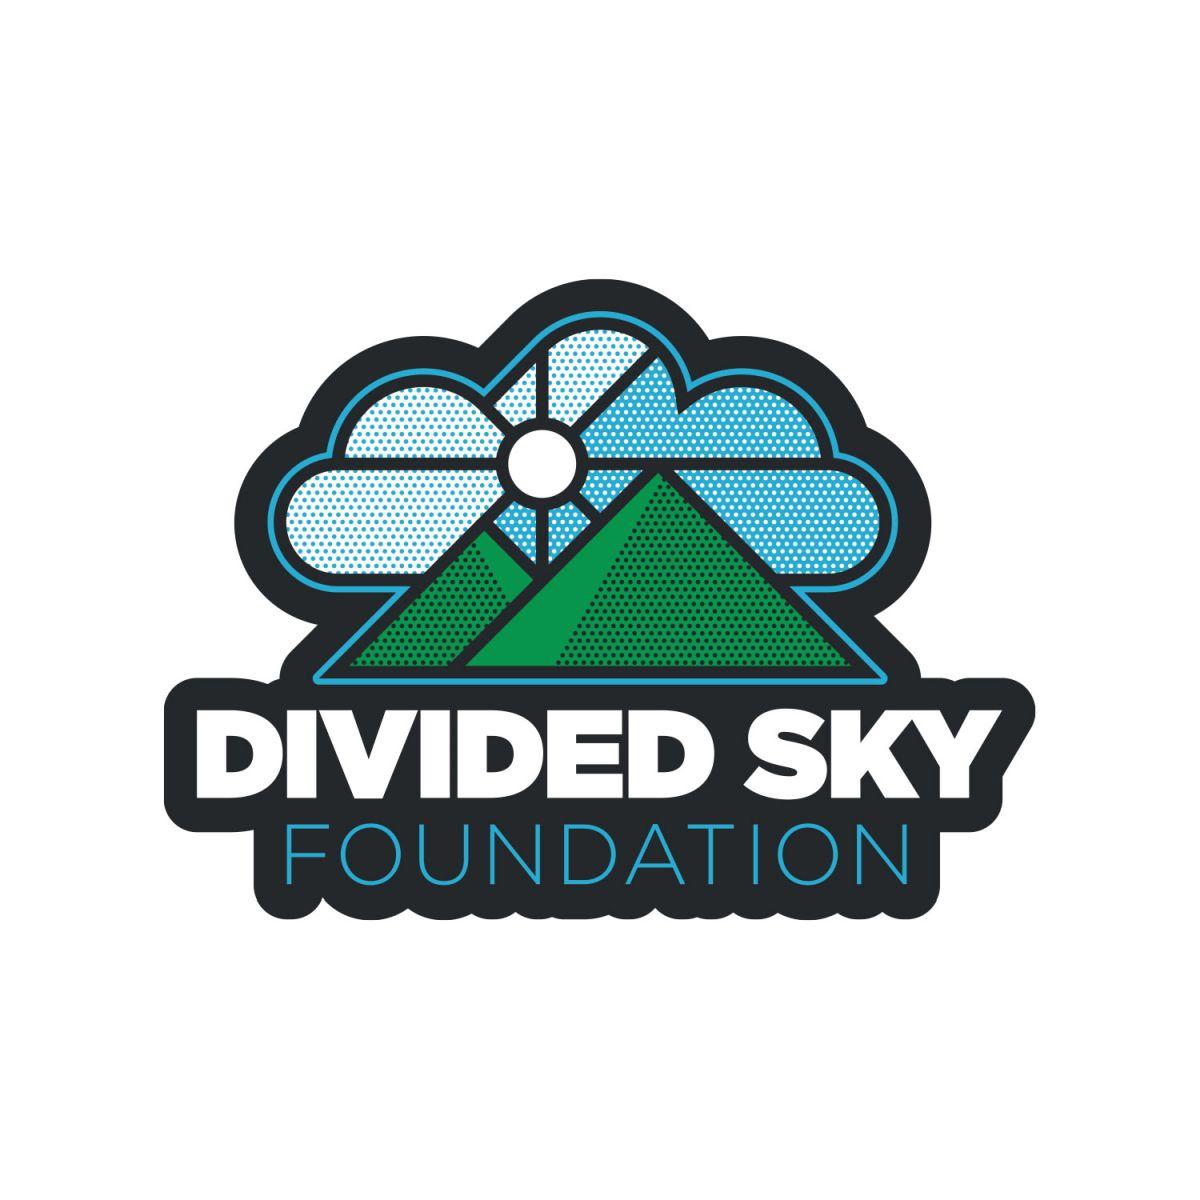 Divided Sky Foundation Sticker